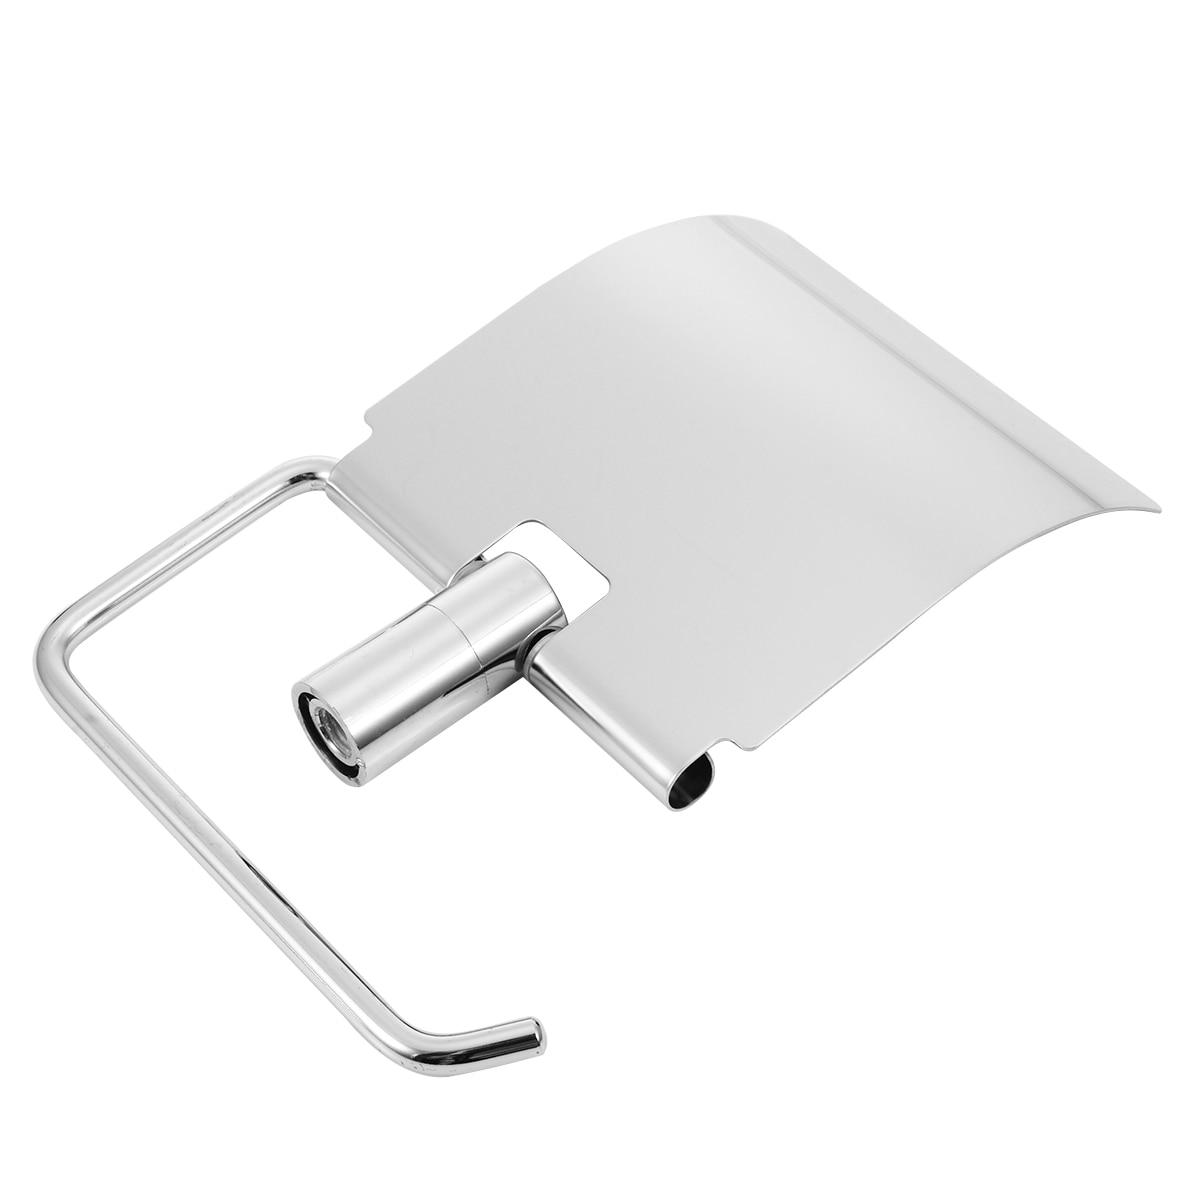 Stainless Steel Wall Mounted Toilet Paper Holder Tissue Paper Holder Roll Dispenser Storage Shelf for Bathroom Accessories